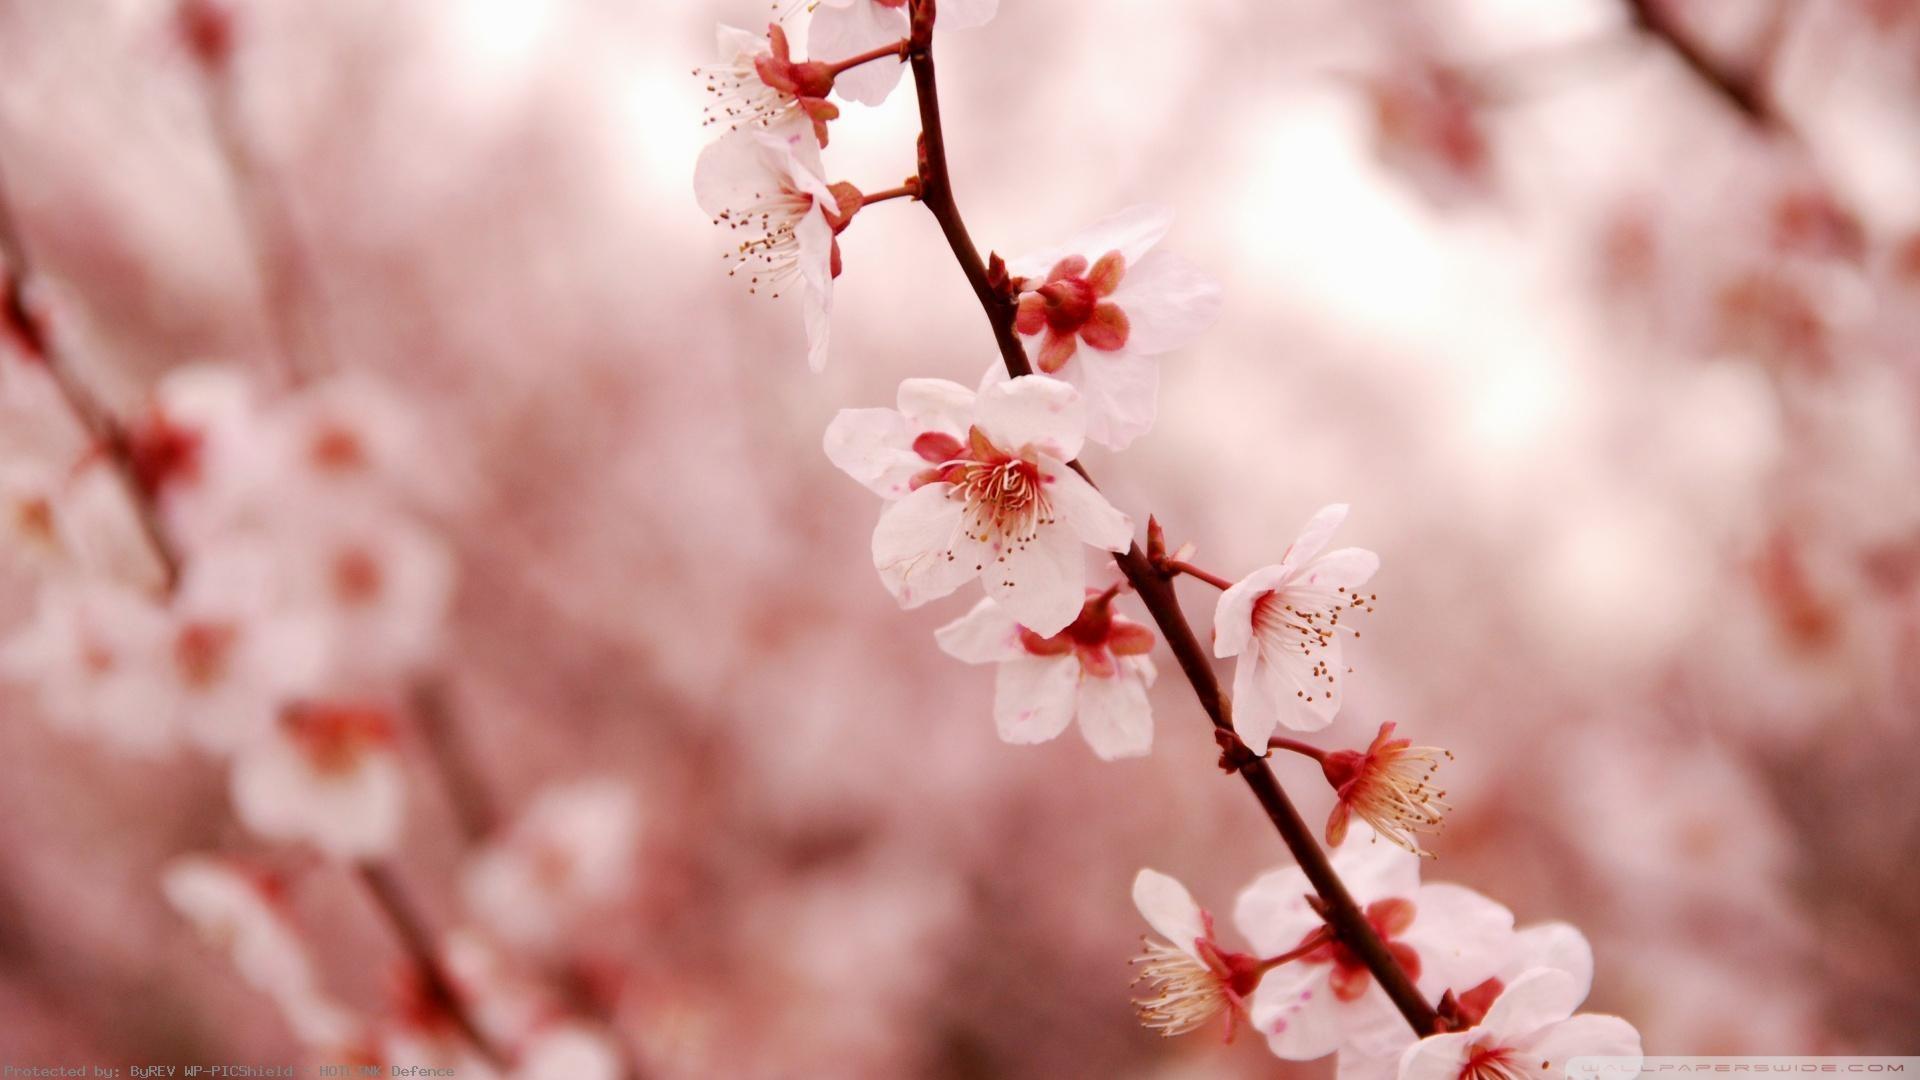 Cherry-Blossom-wallpaper-wpc9003462